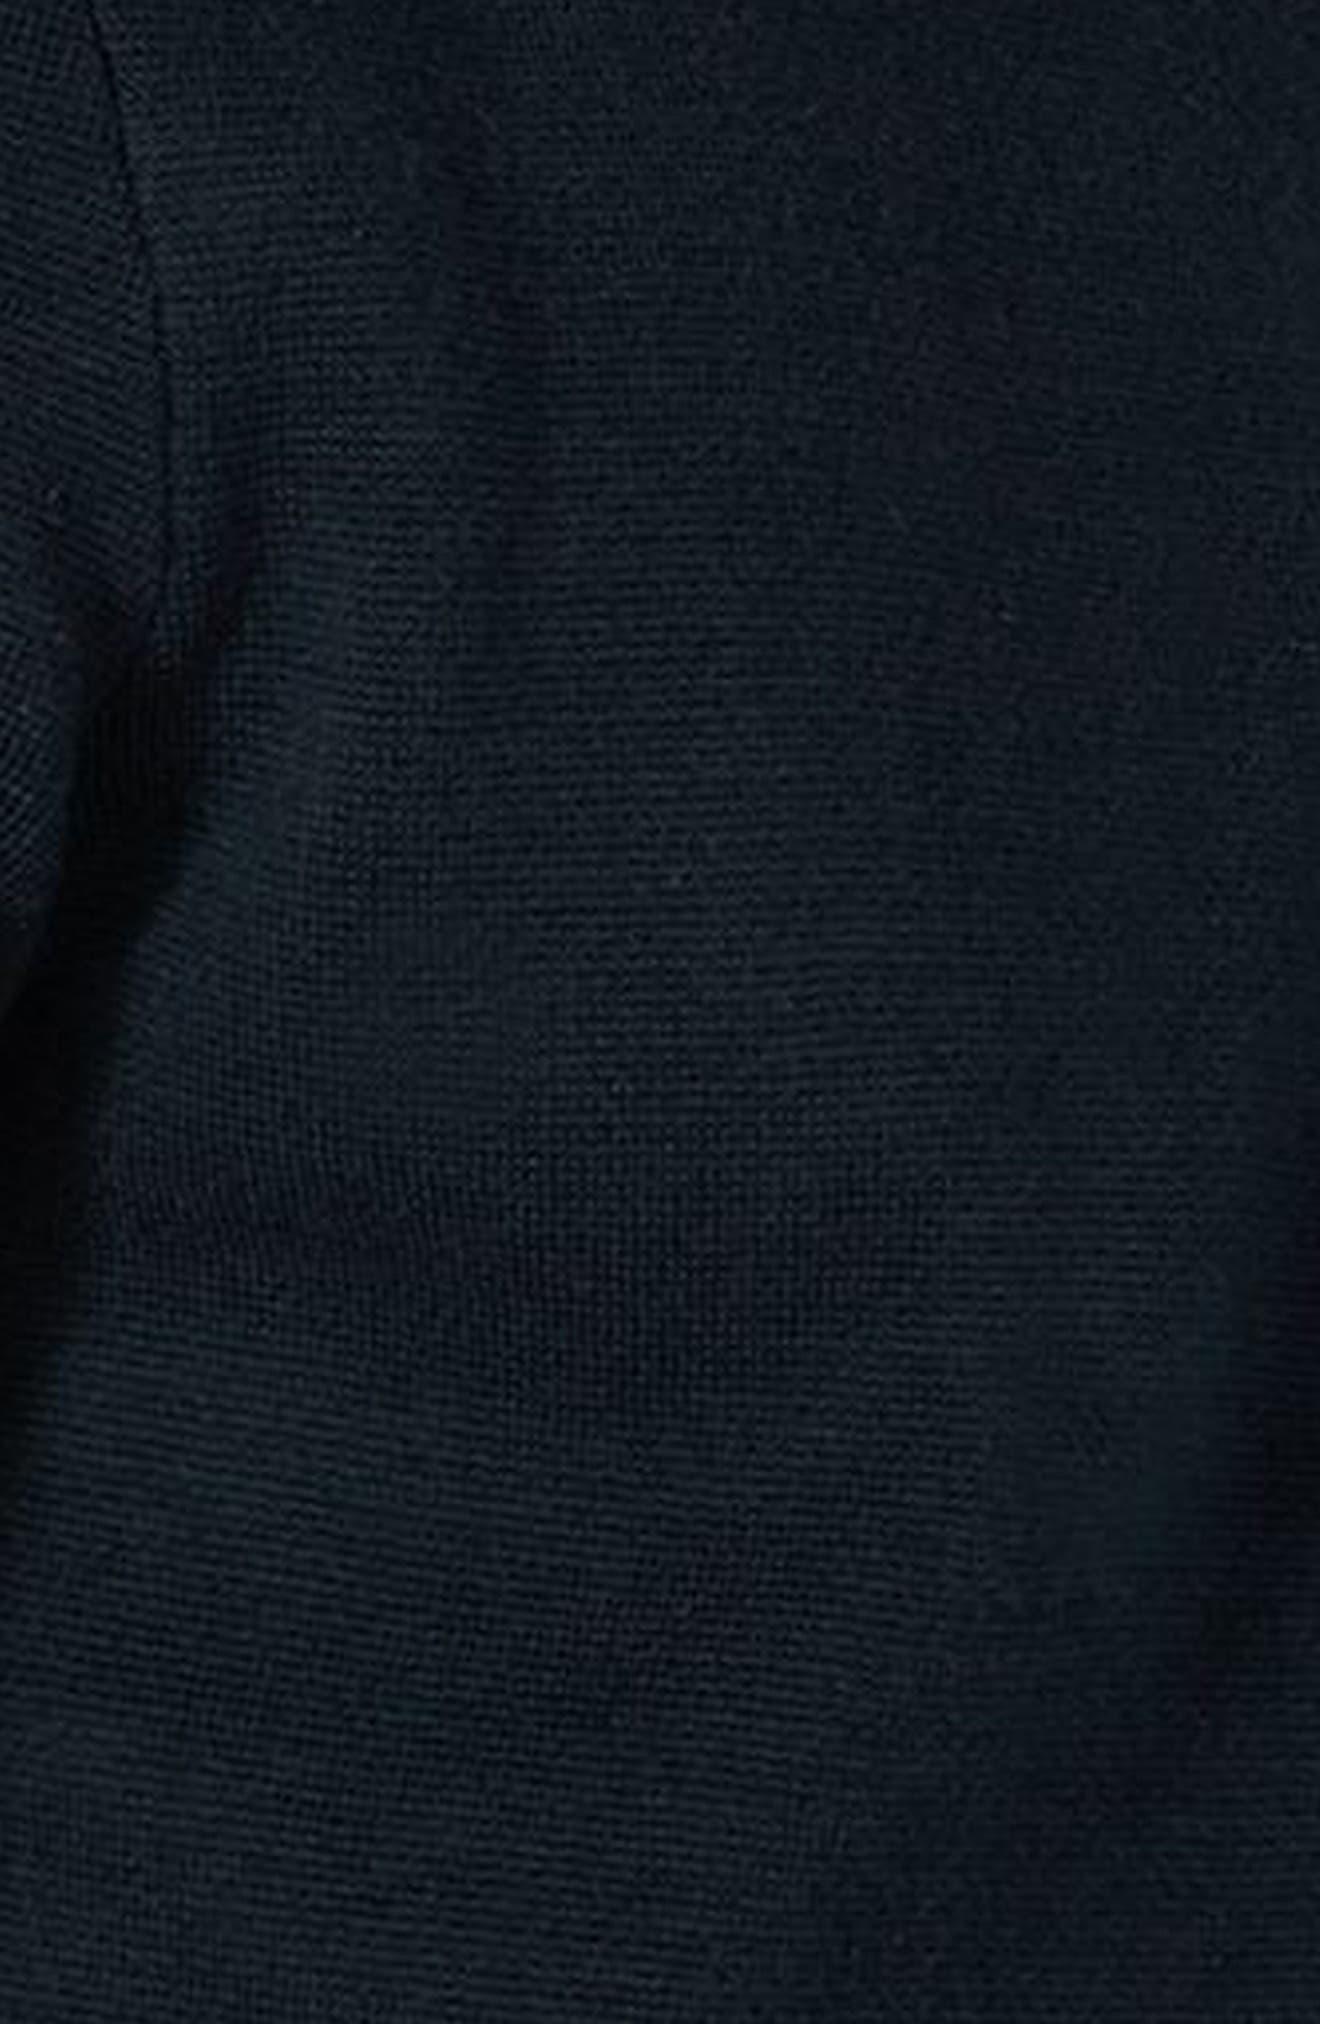 Stripe Knit Zip Front Harrington Sweatshirt,                             Alternate thumbnail 3, color,                             Navy Blue Multi